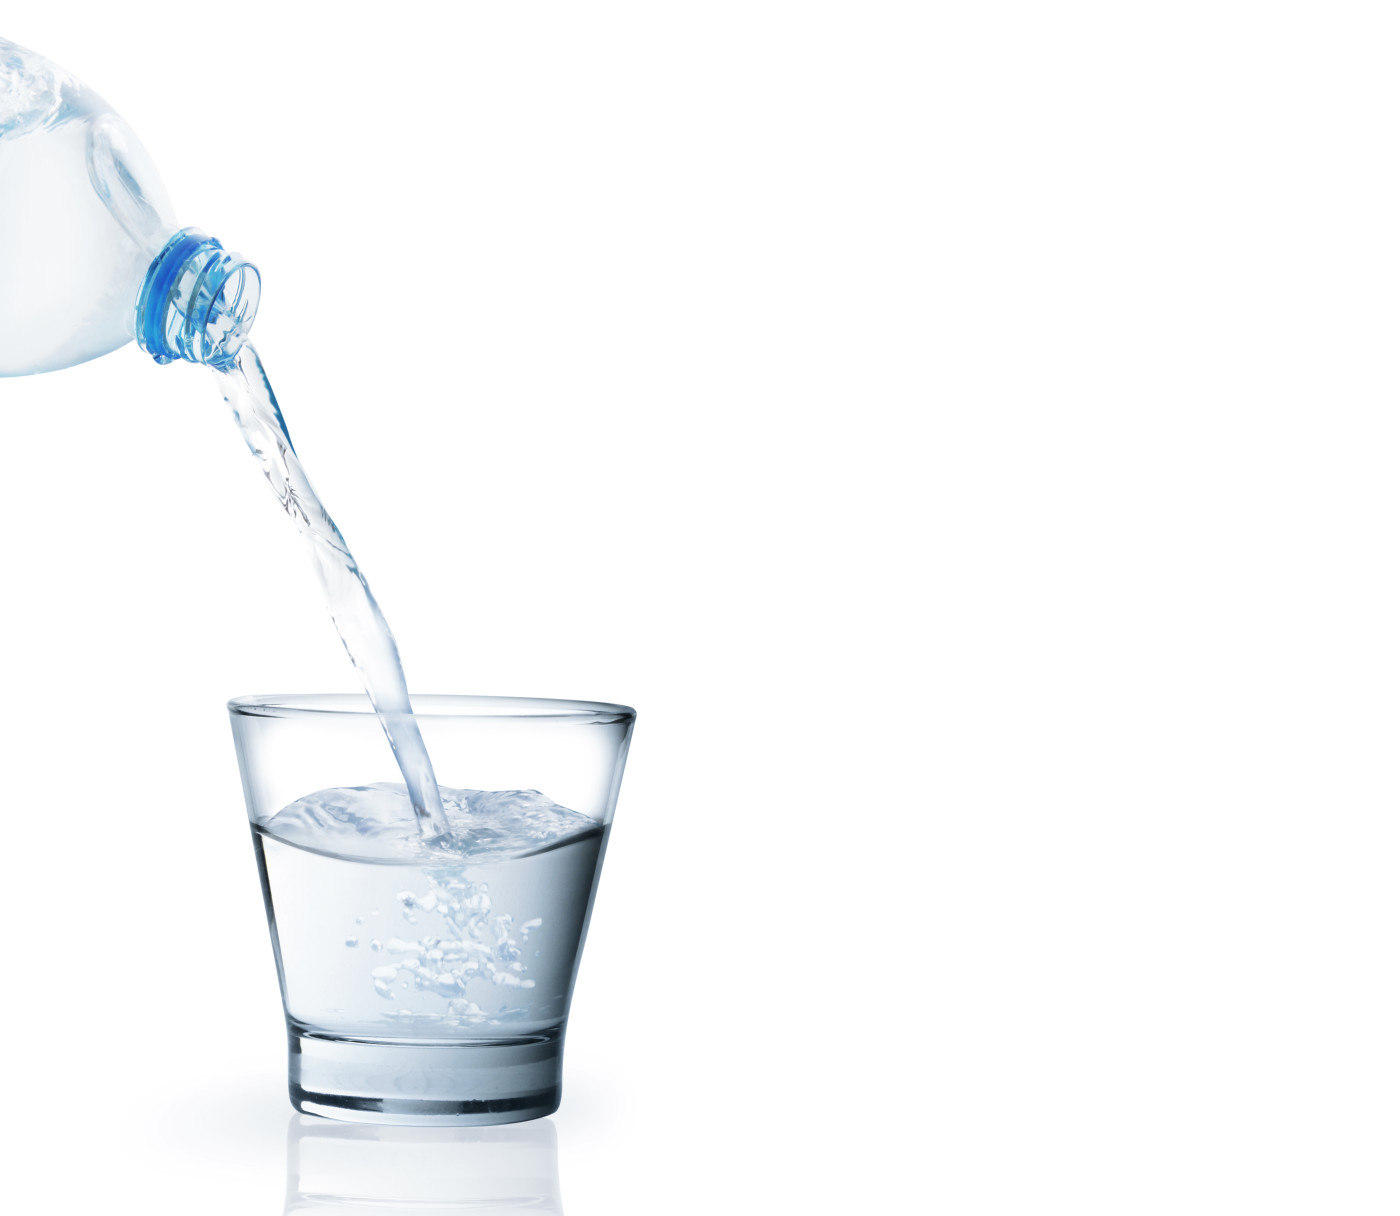 Engorda beber agua